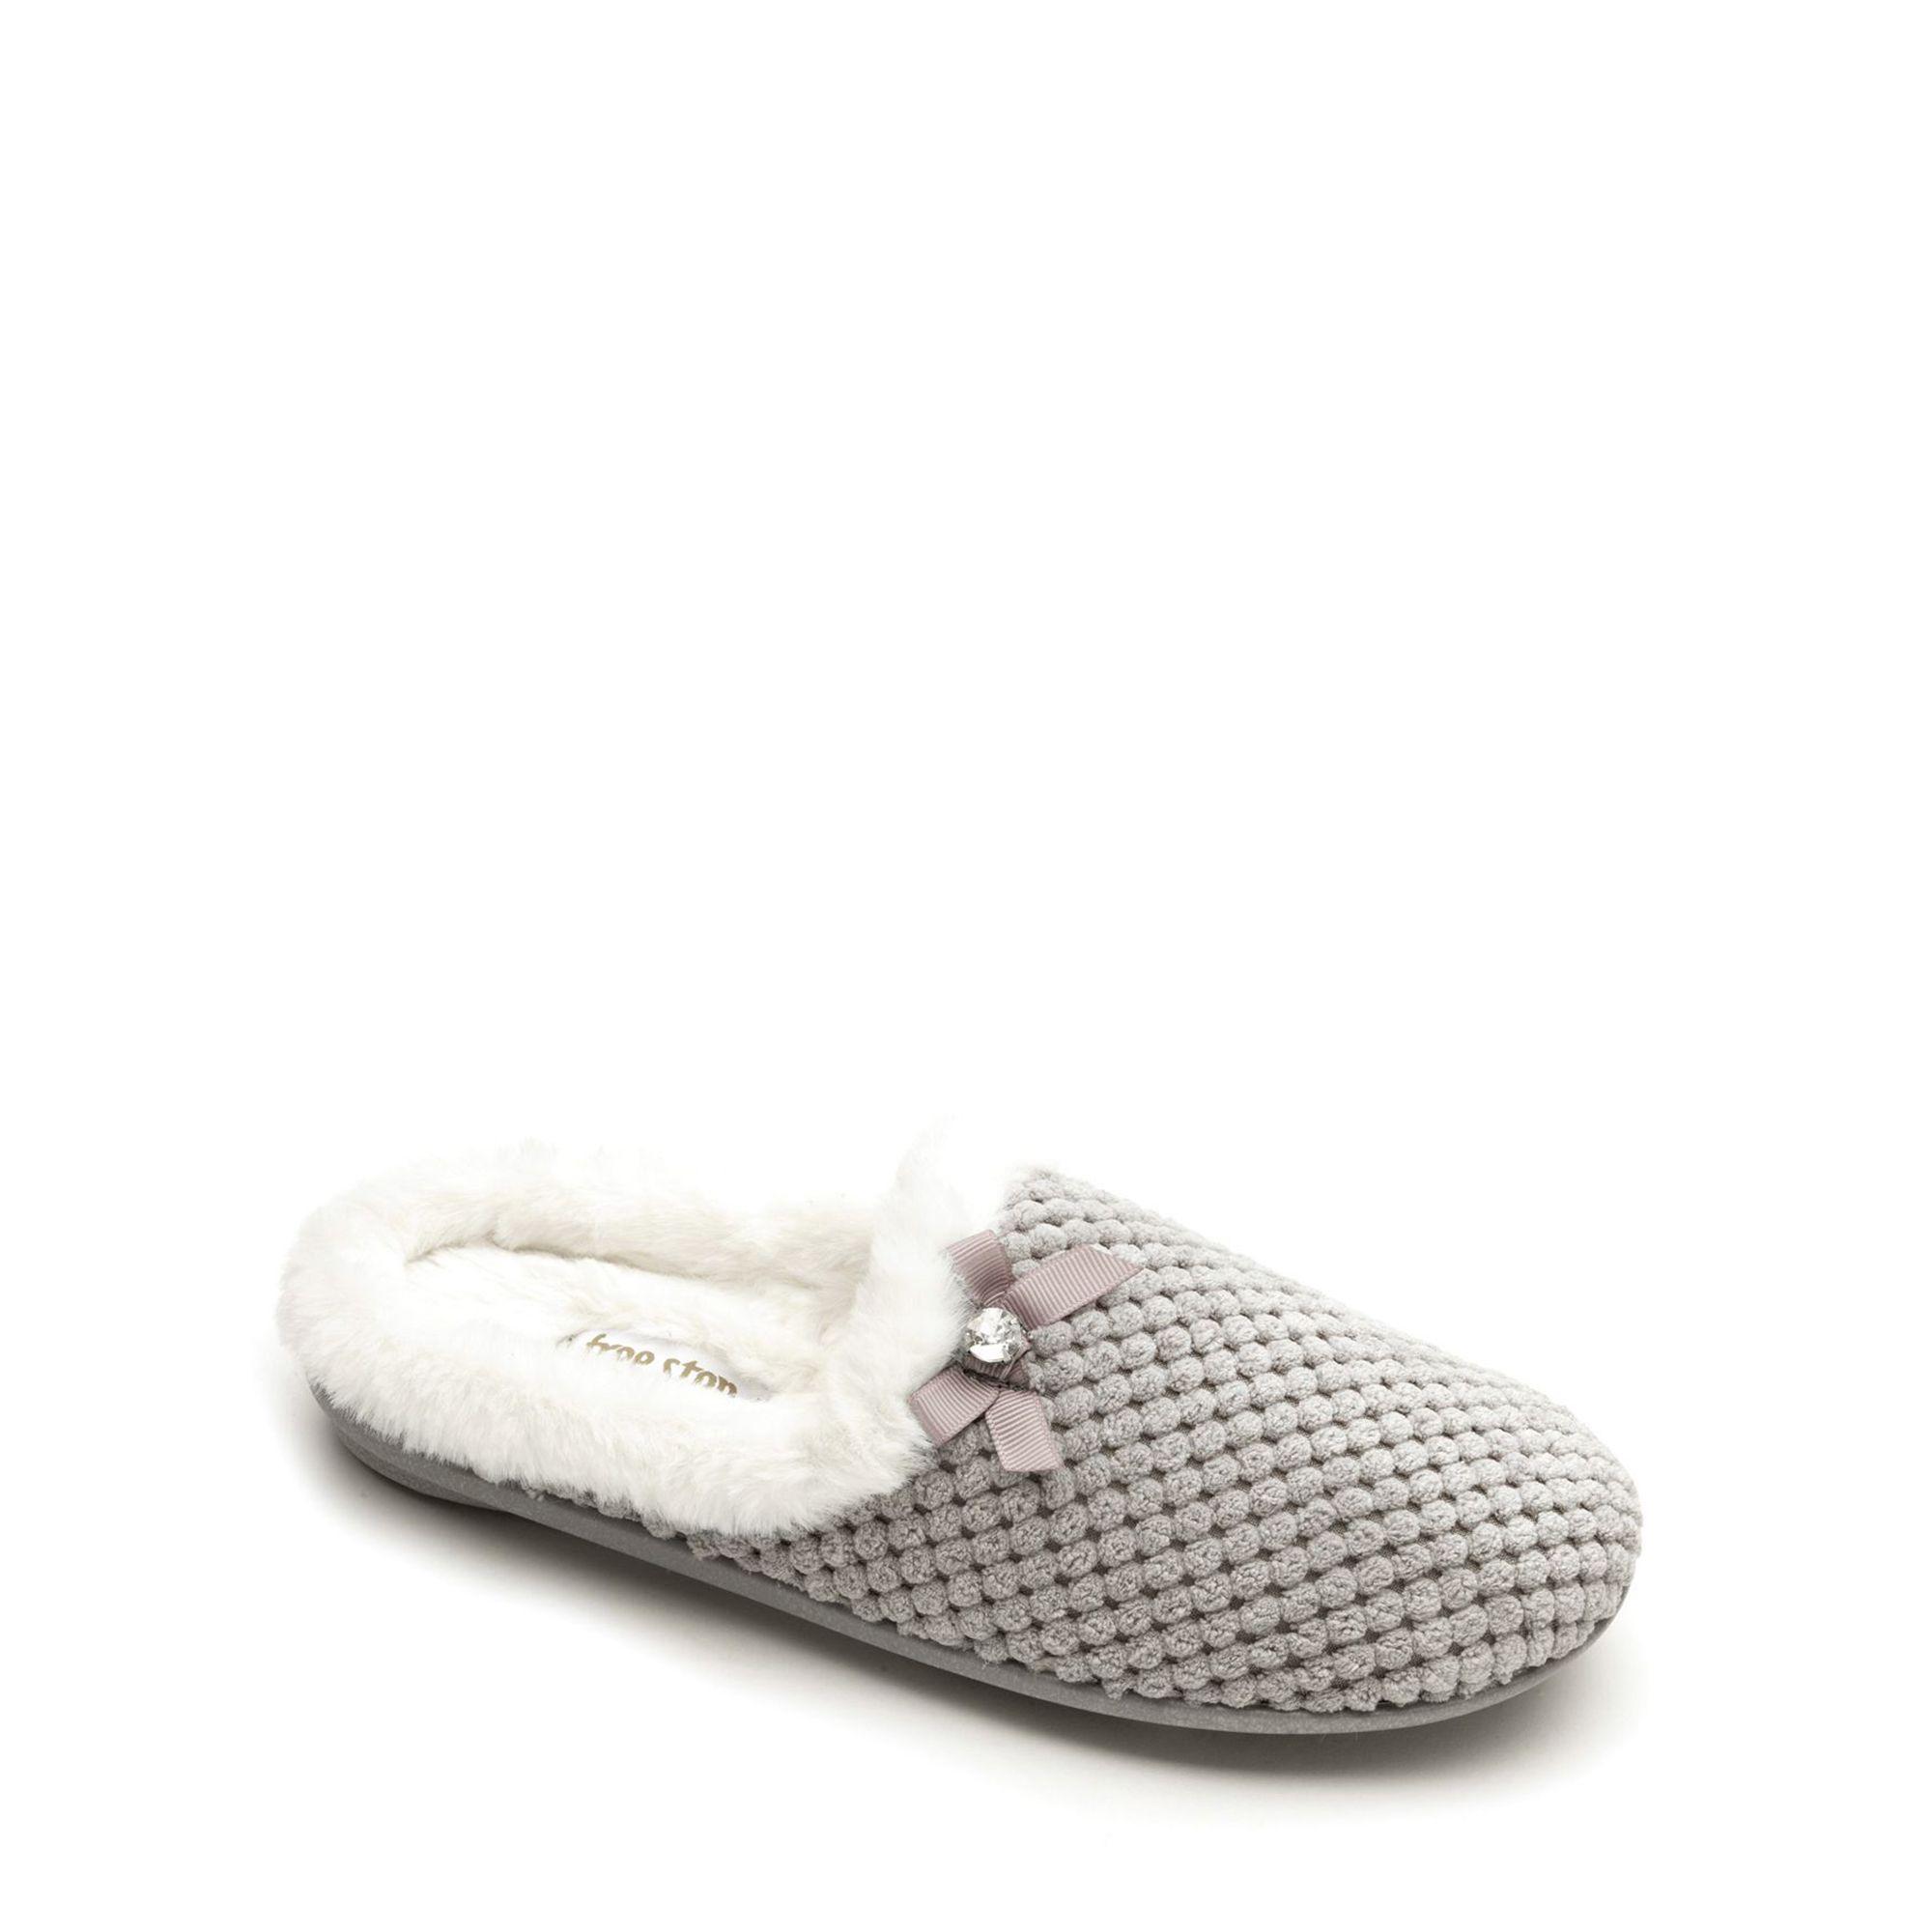 discount order Grey textile ladies slippers cheap sale visit new sale recommend ebay cheap price CSqxzJz3qo